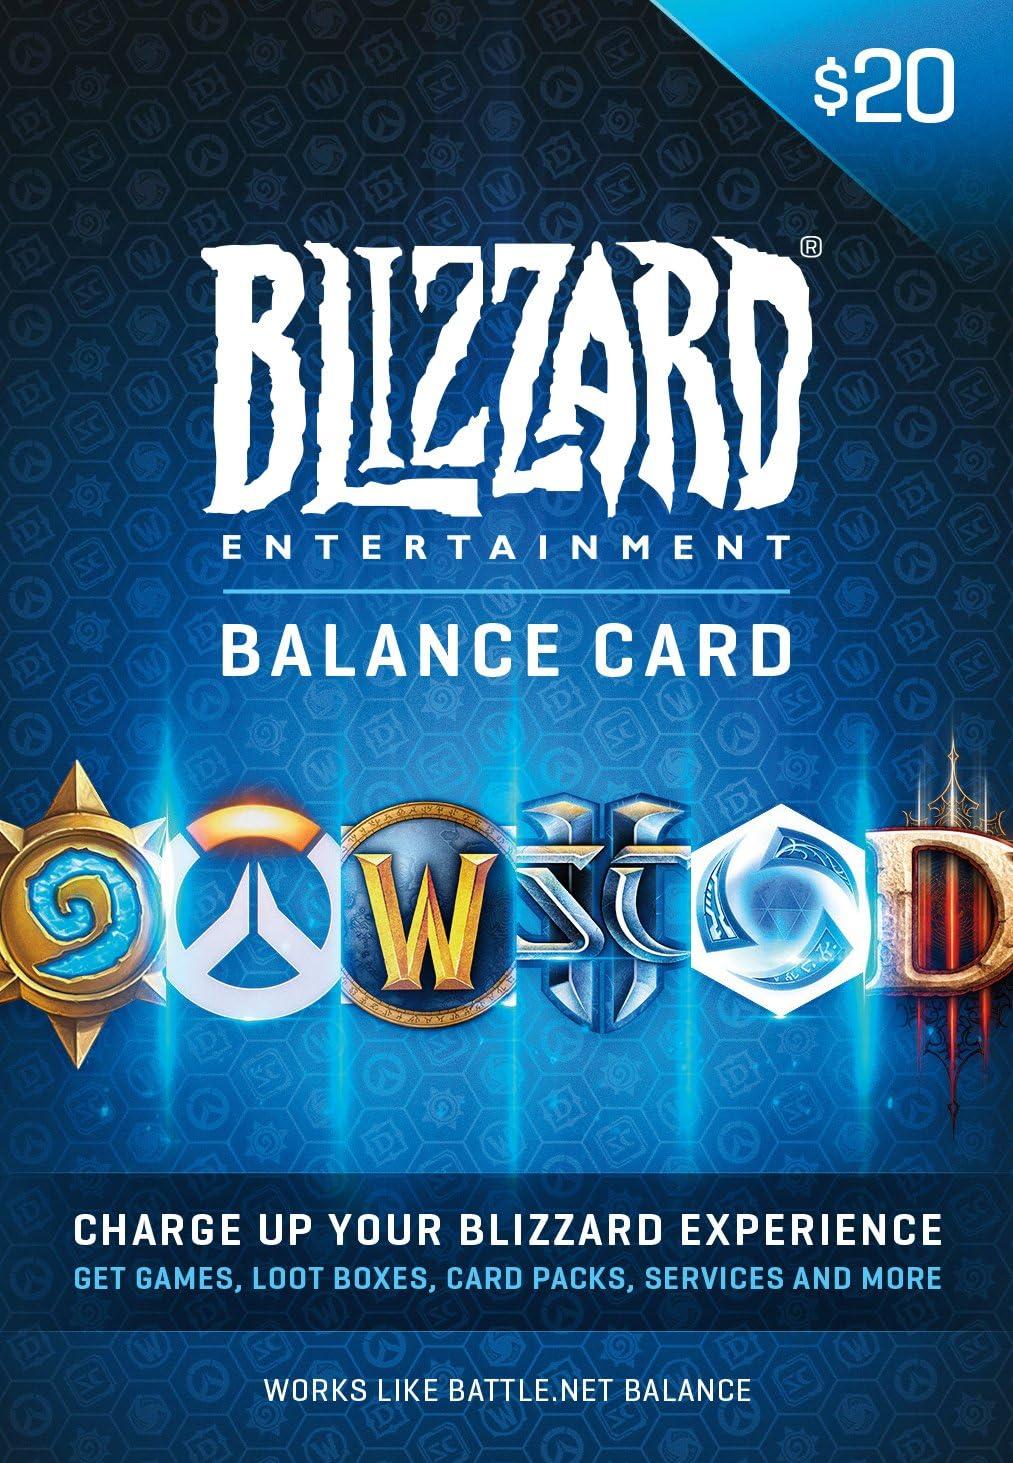 Amazon.com: $20 Battle.net Store Gift Card Balance - Blizzard Entertainment [Digital Code] [Online Game Code]: Video Games